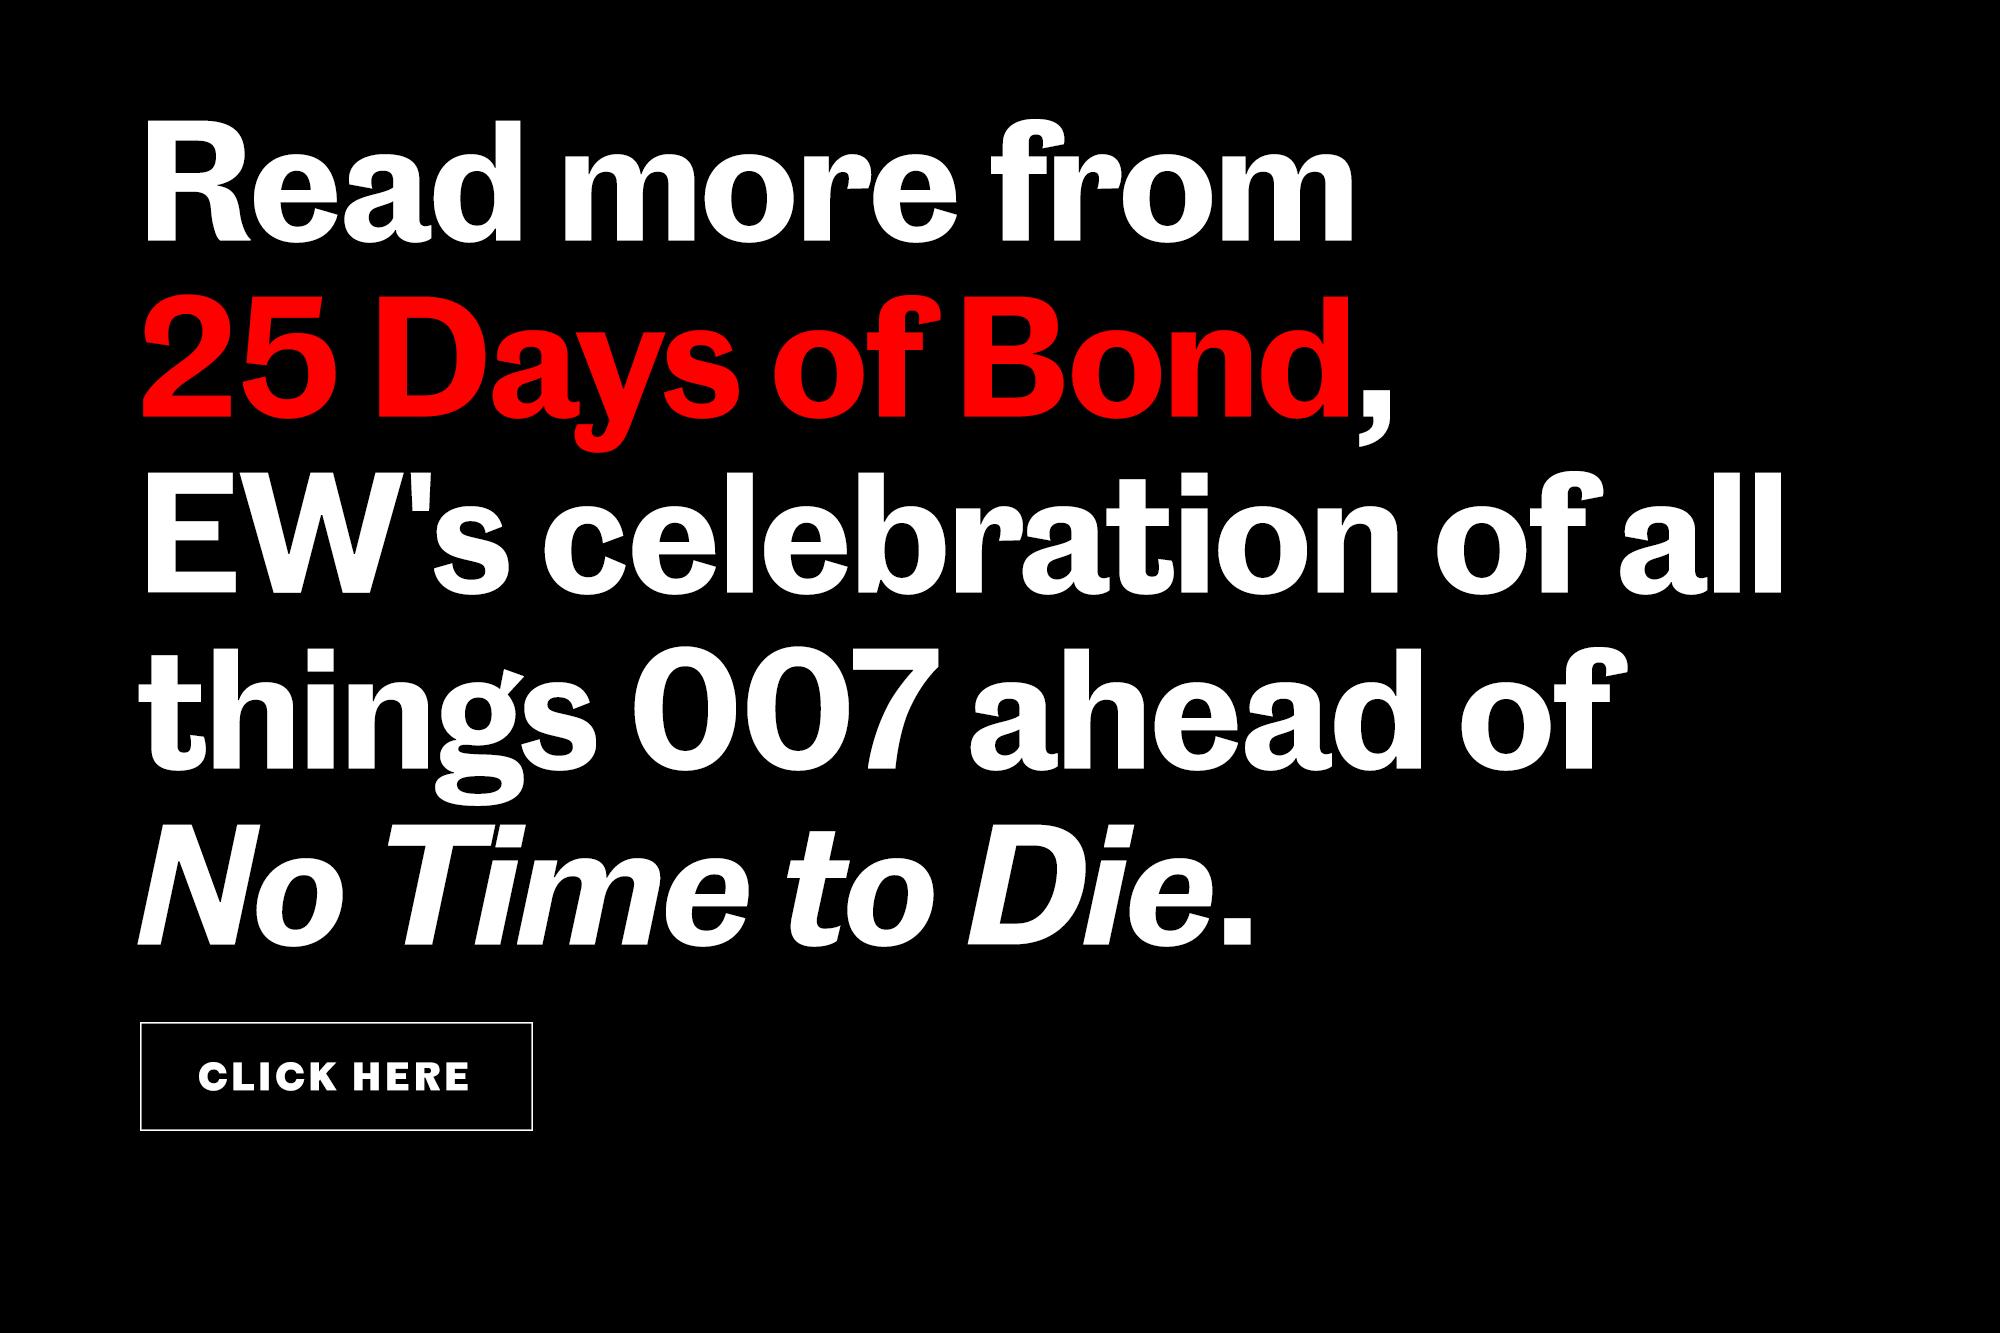 James Bond Tout